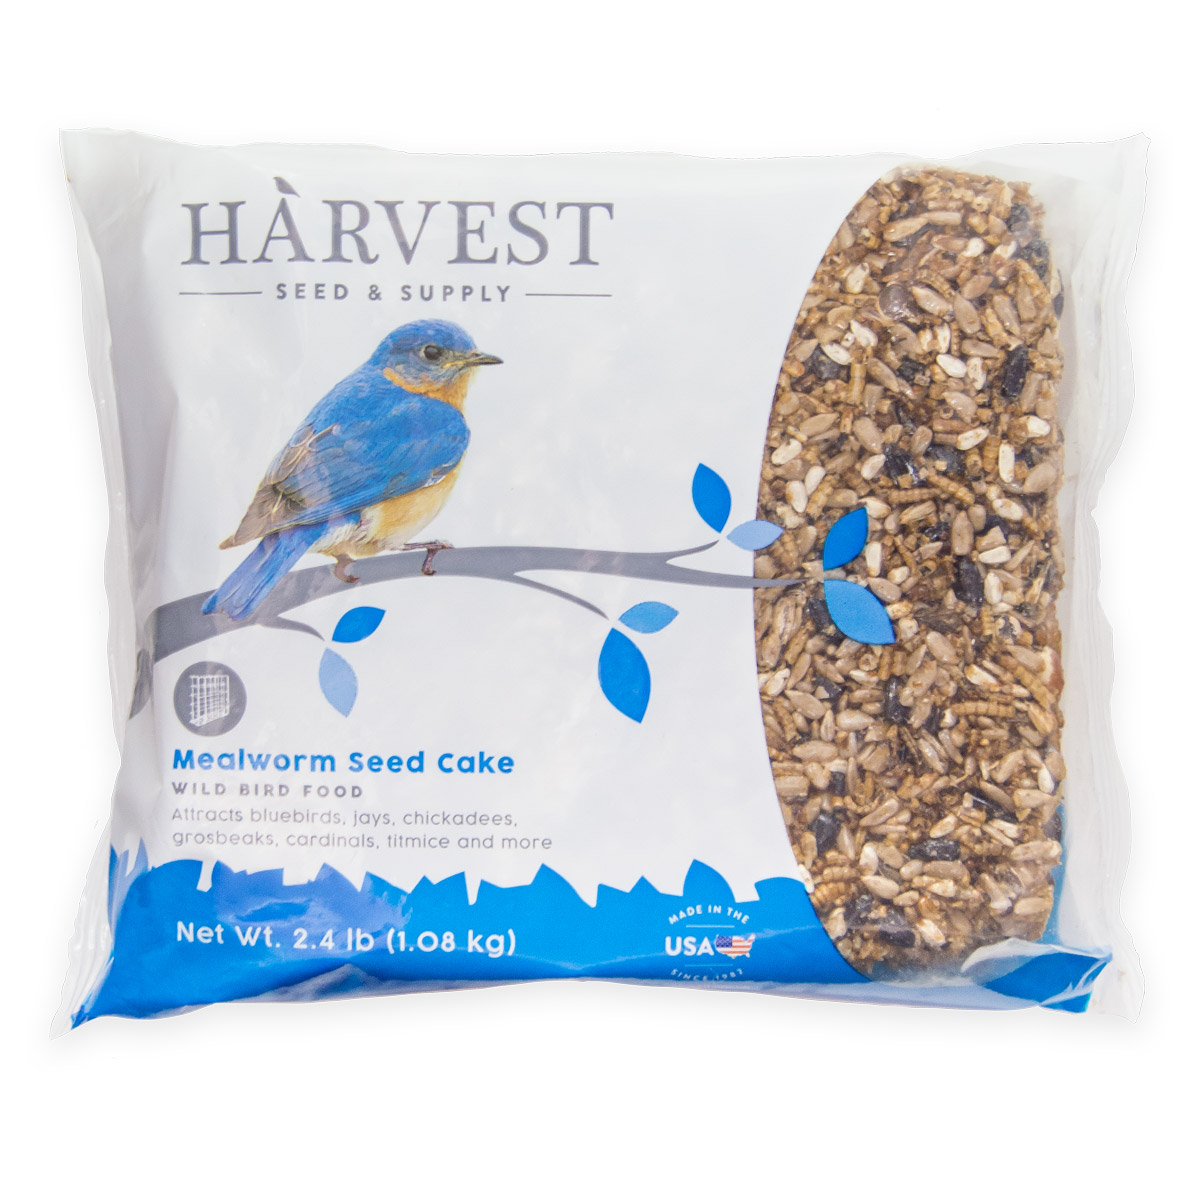 Mealworm Seed Cake Image